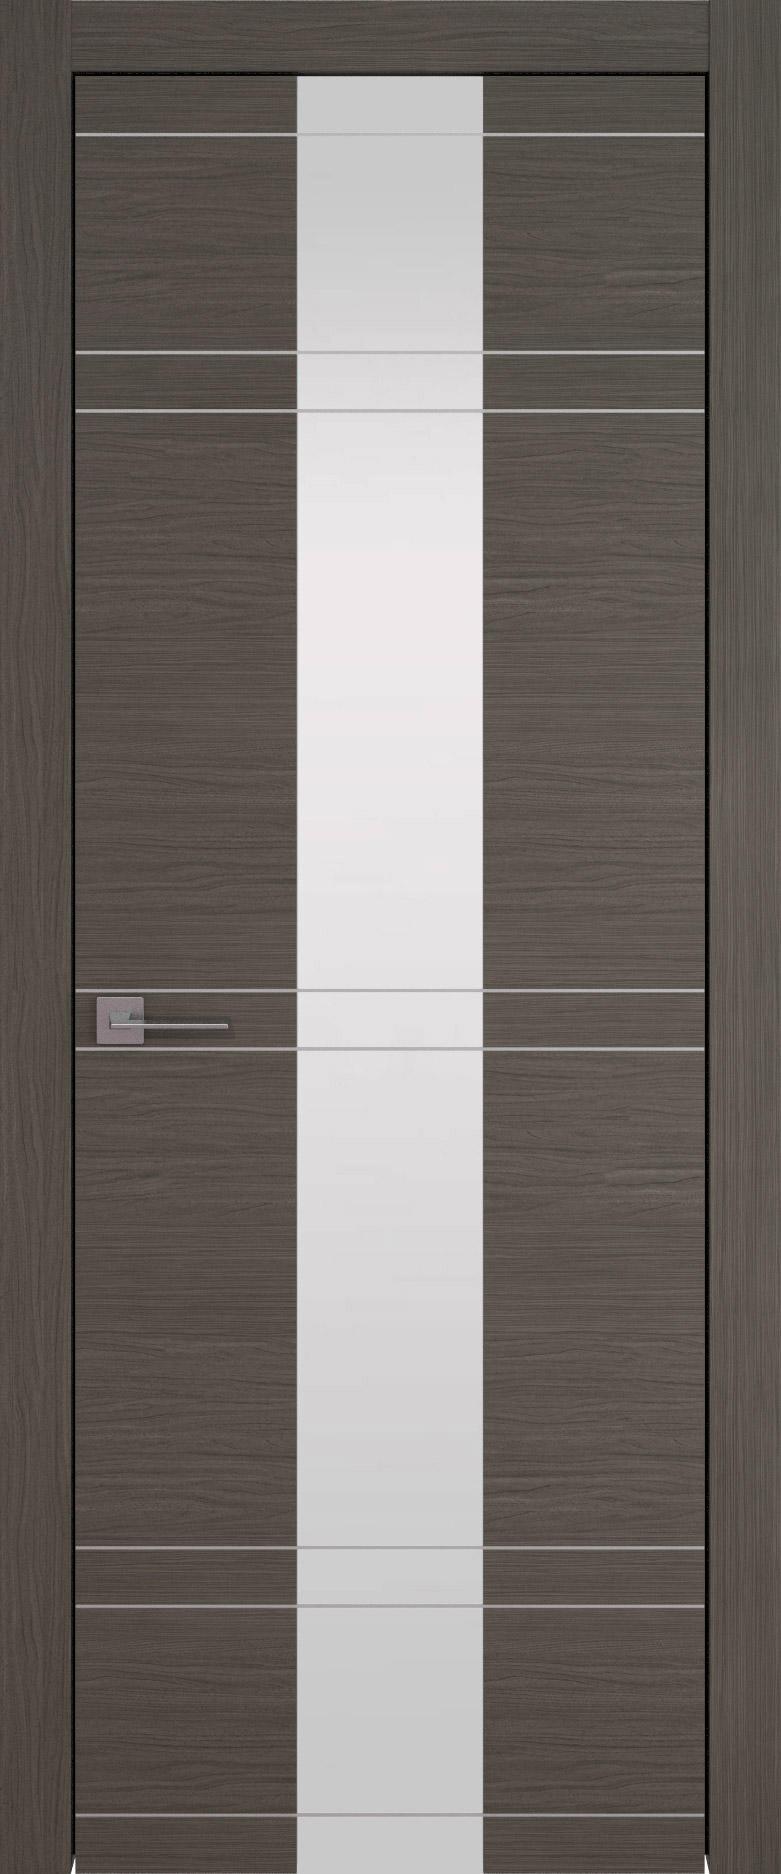 Tivoli Ж-4 цвет - Дуб графит Со стеклом (ДО)